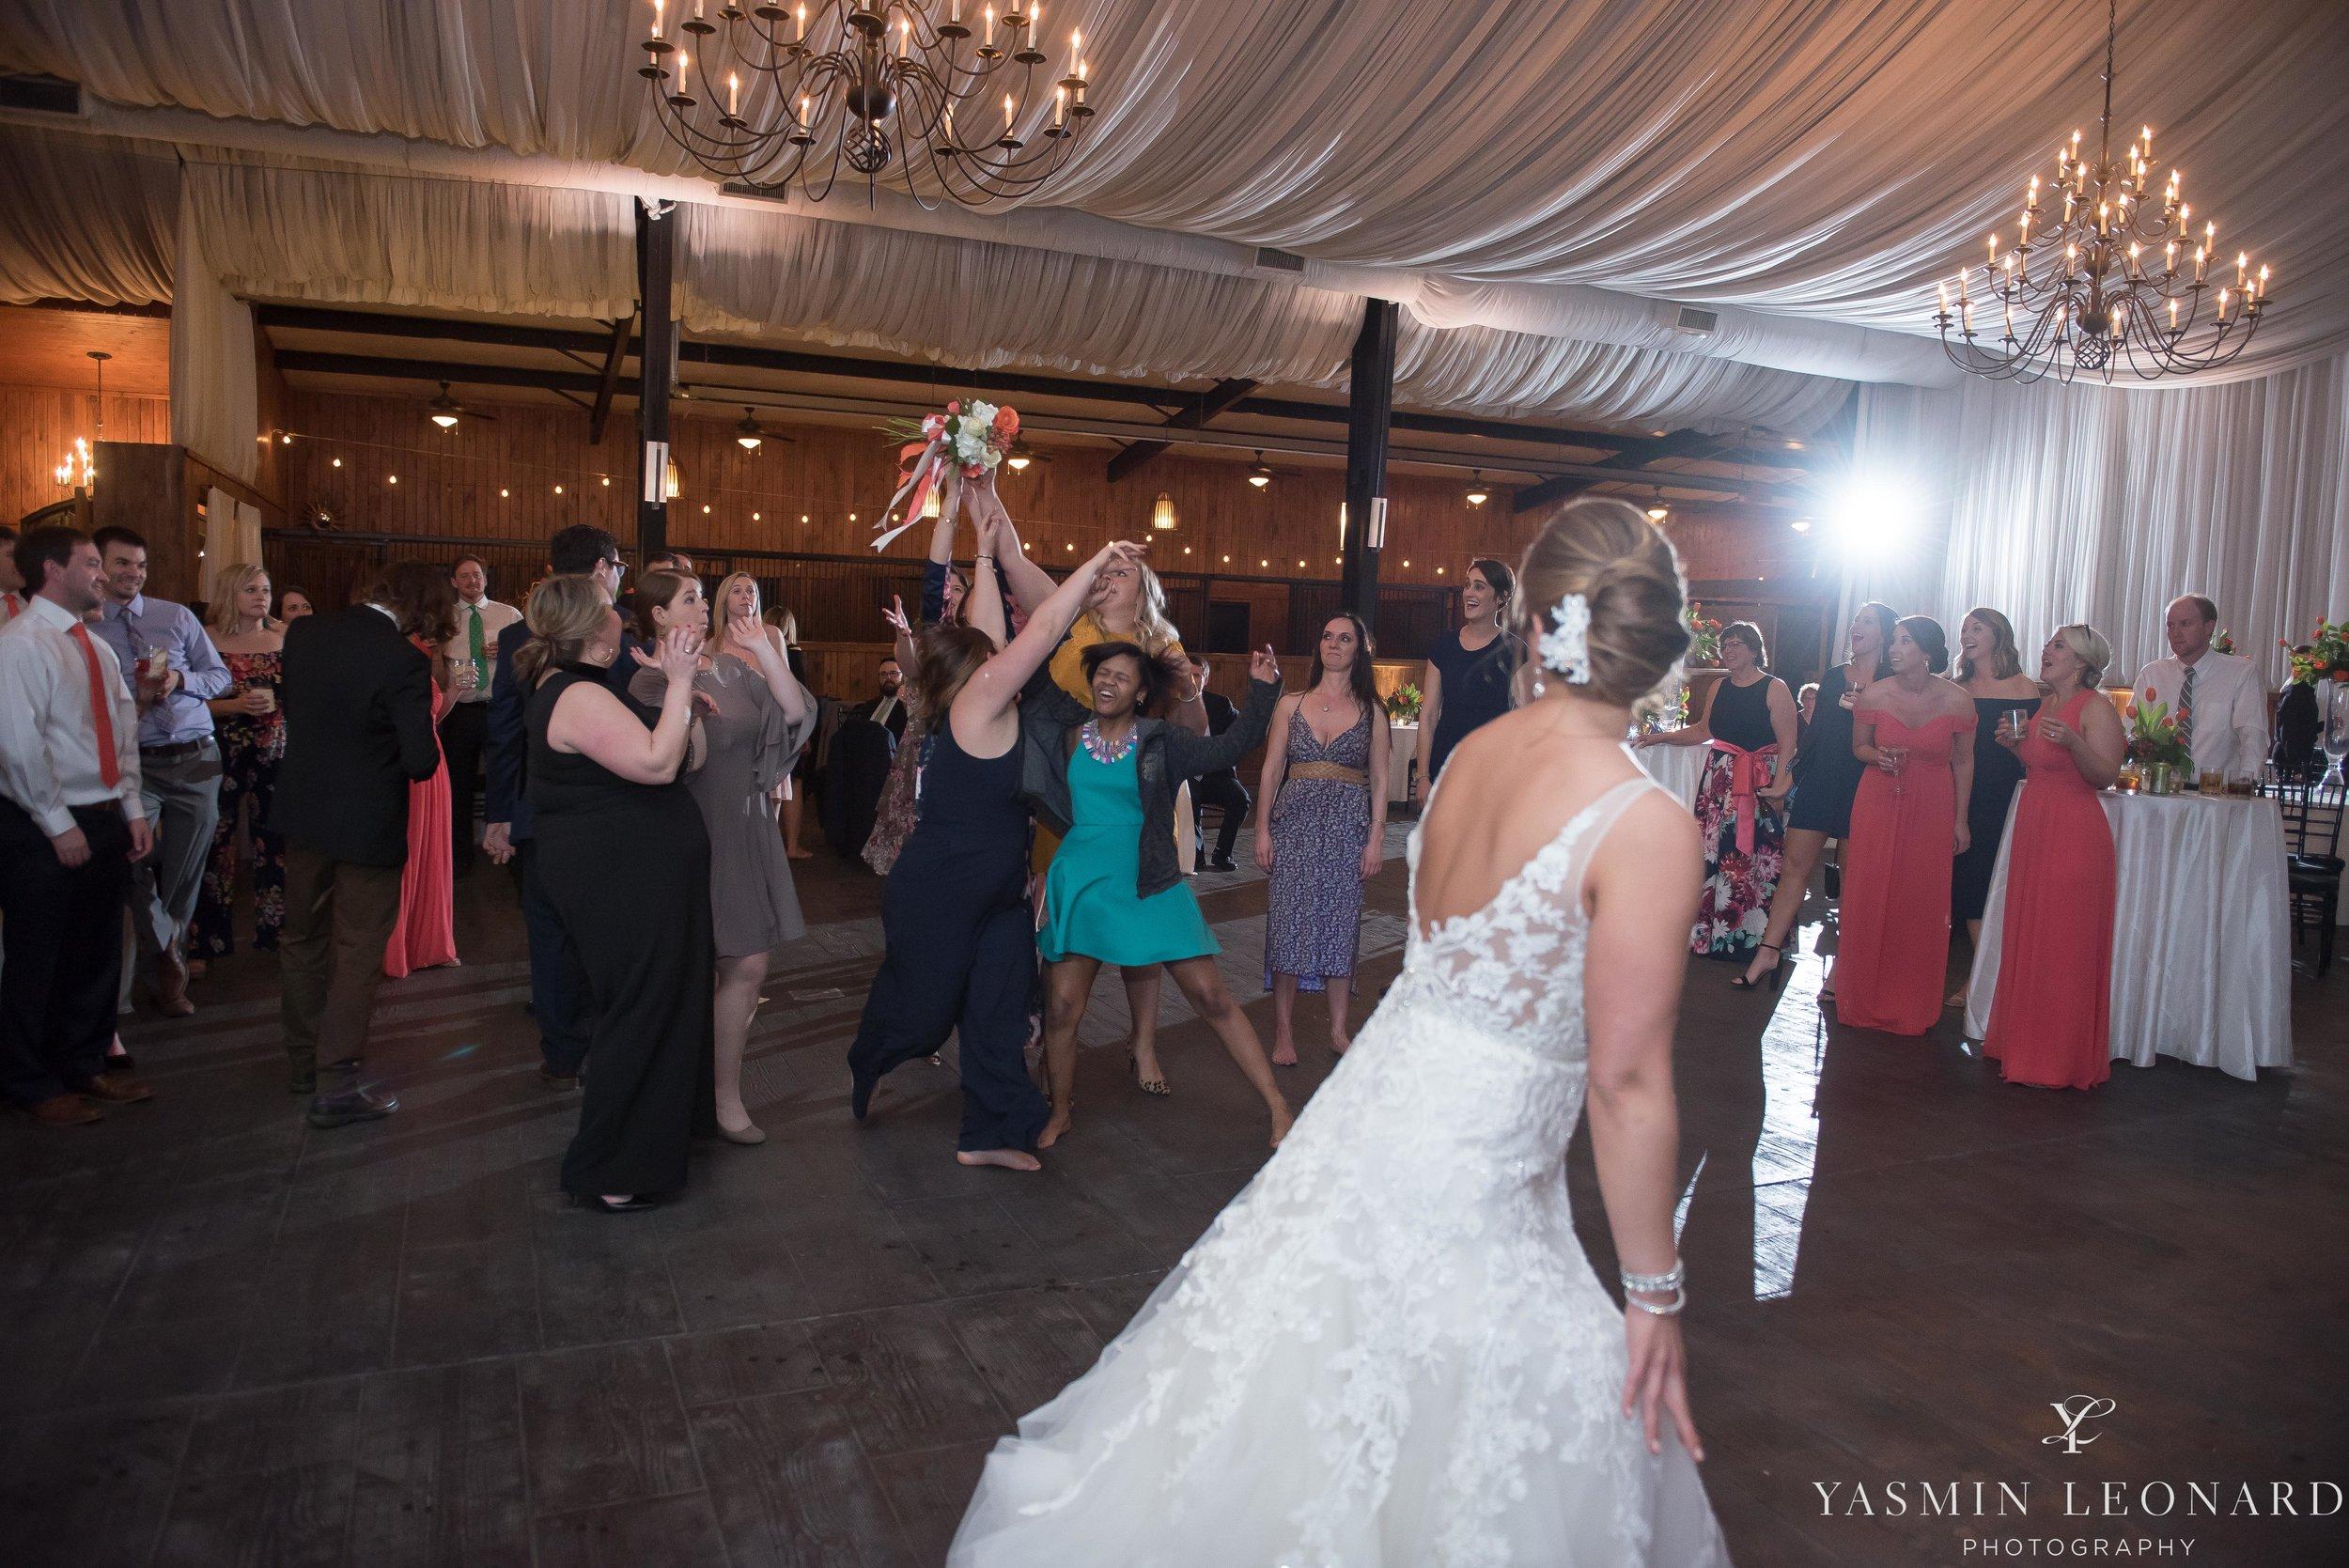 Adaumont Farm - Adaumont Farm Weddings - Trinity Weddings - NC Weddings - Yasmin Leonard Photography-90.jpg